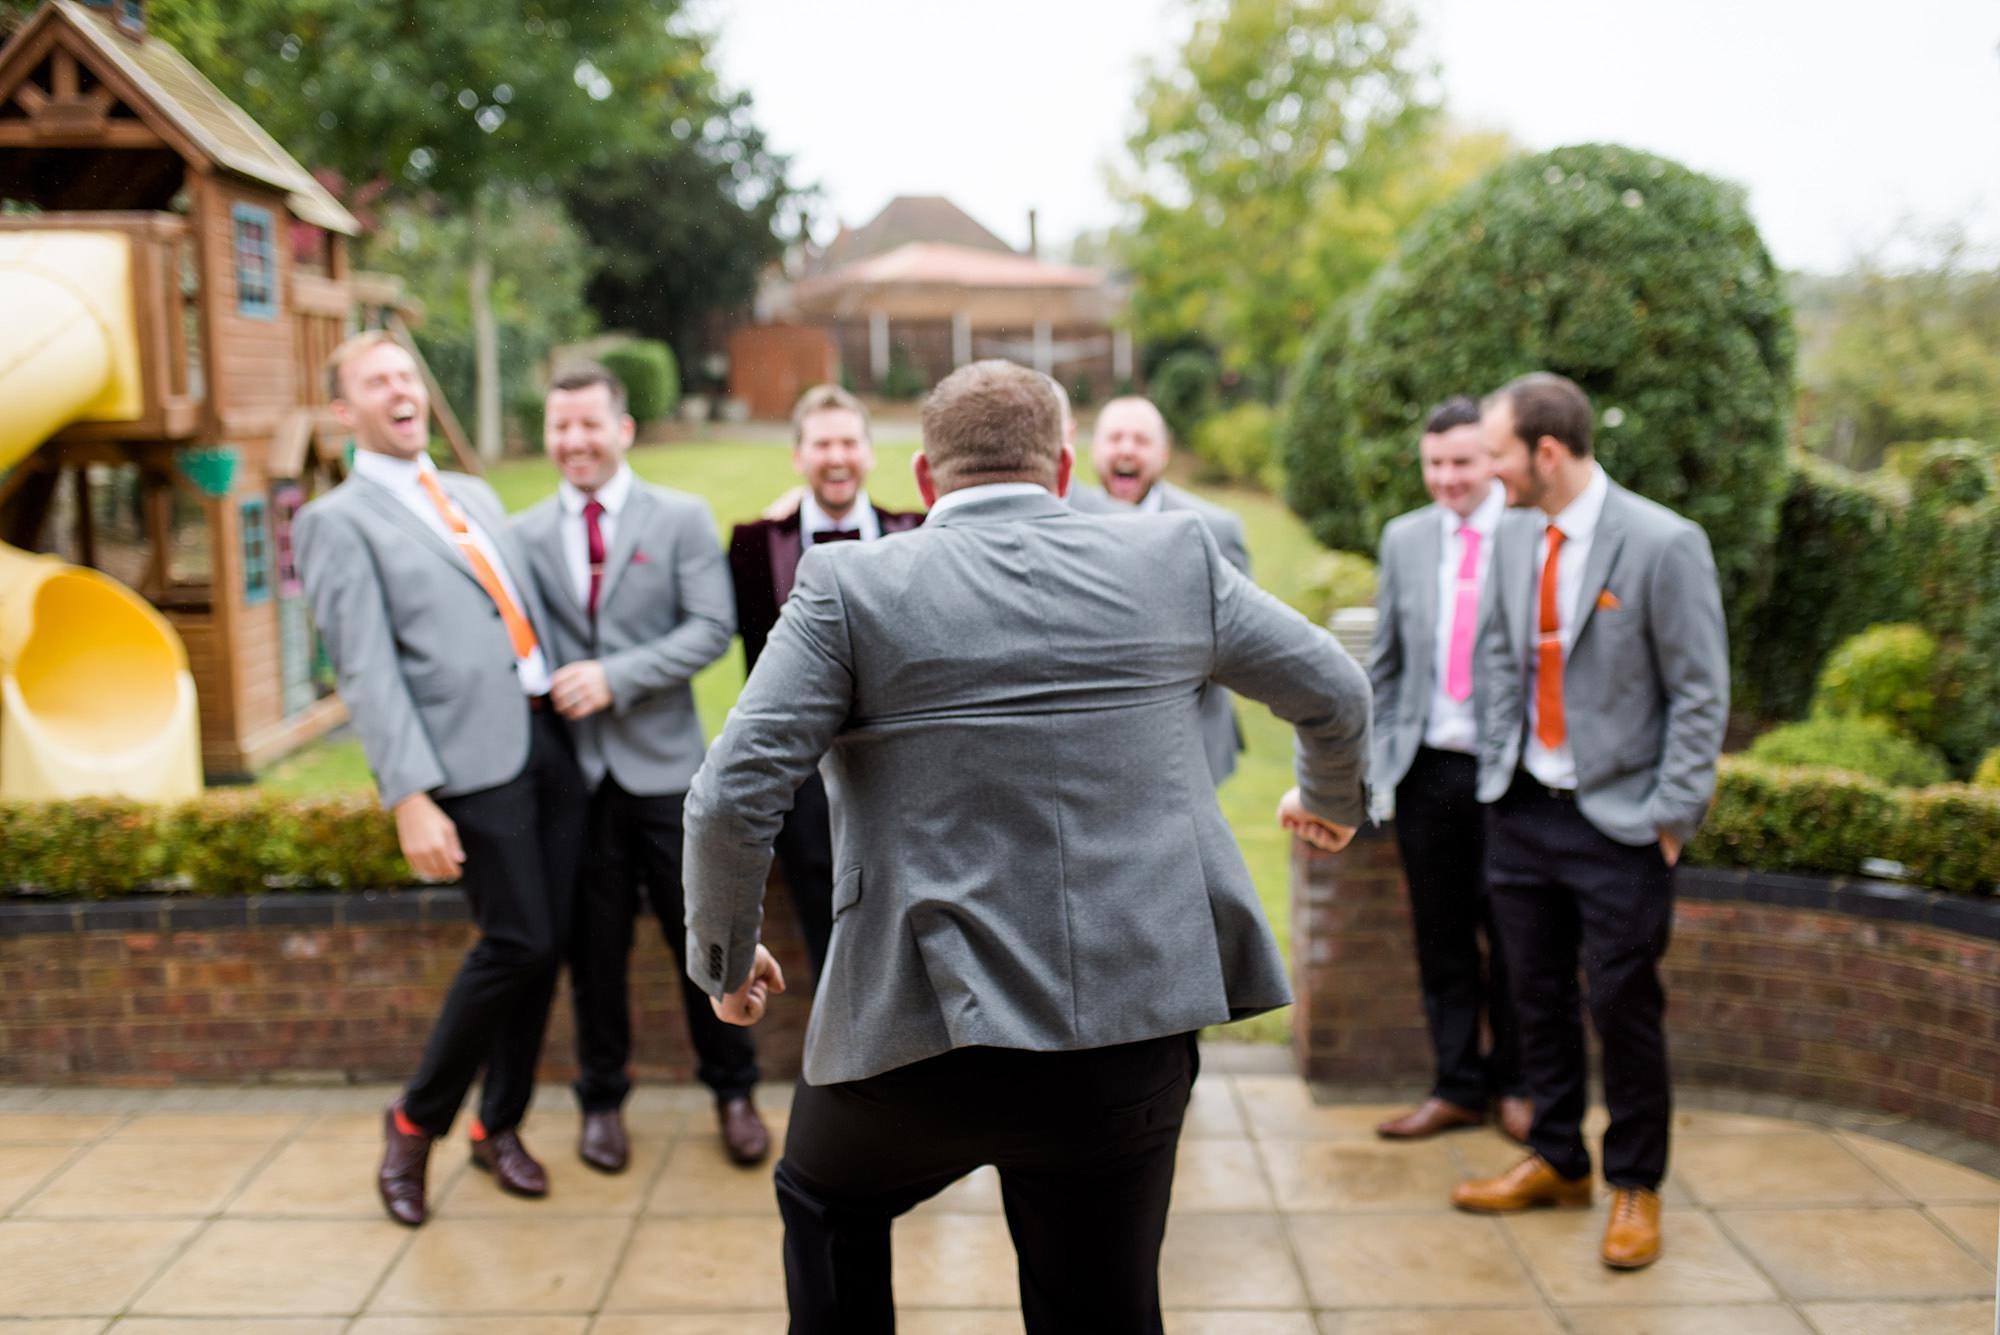 Fun London Wedding funny group portrait of groomsmen